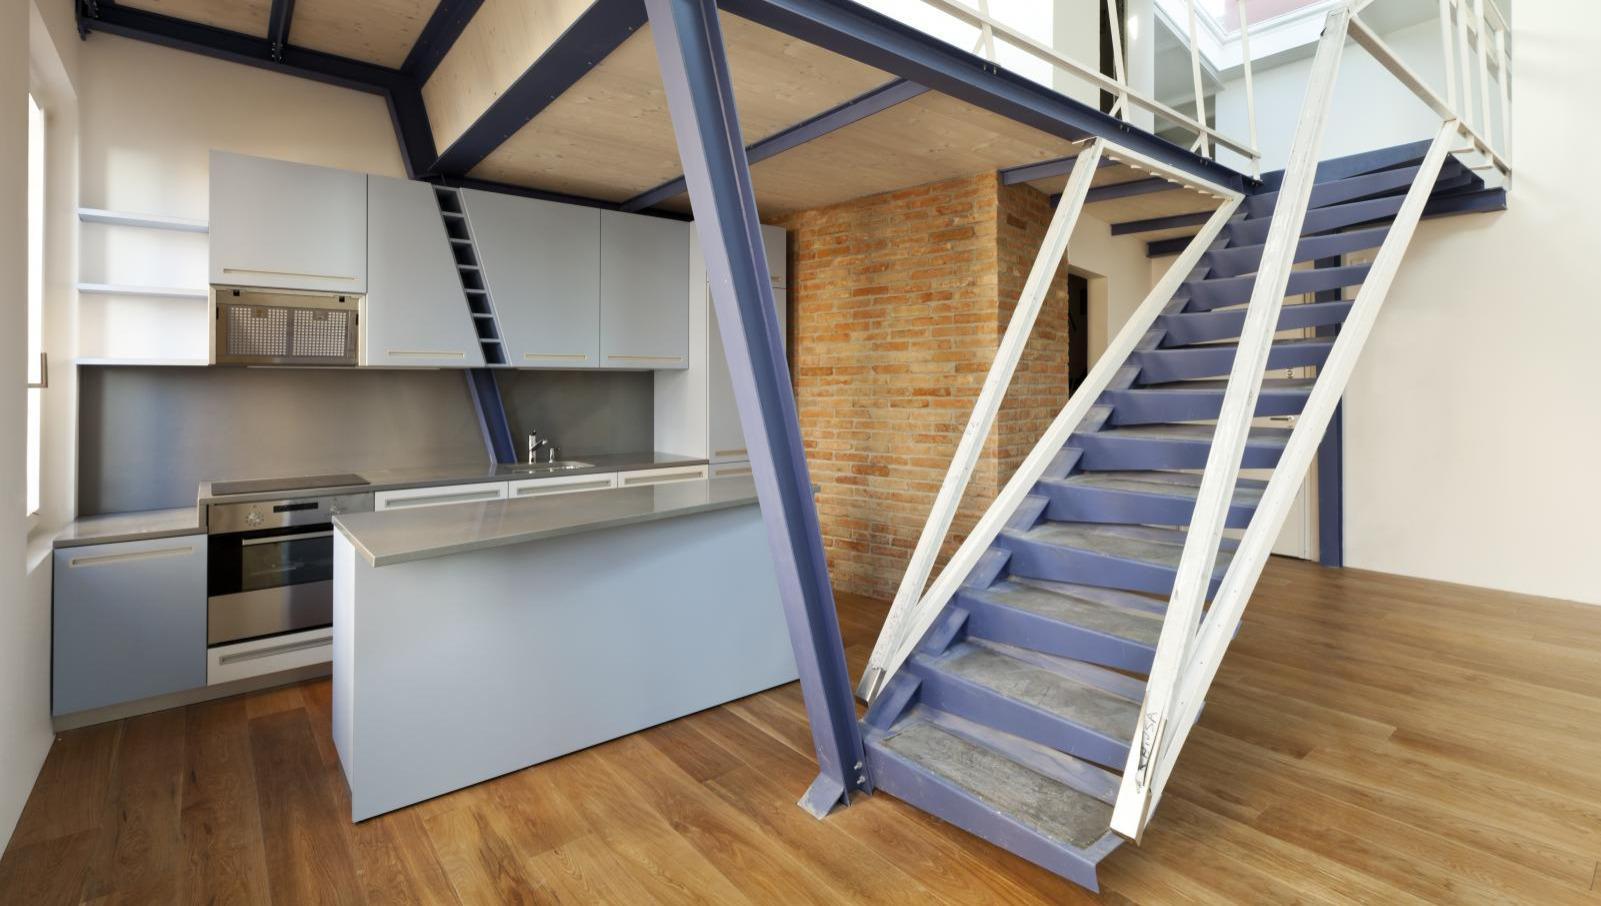 Лестница на второй этаж на металлическом каркасе лофт